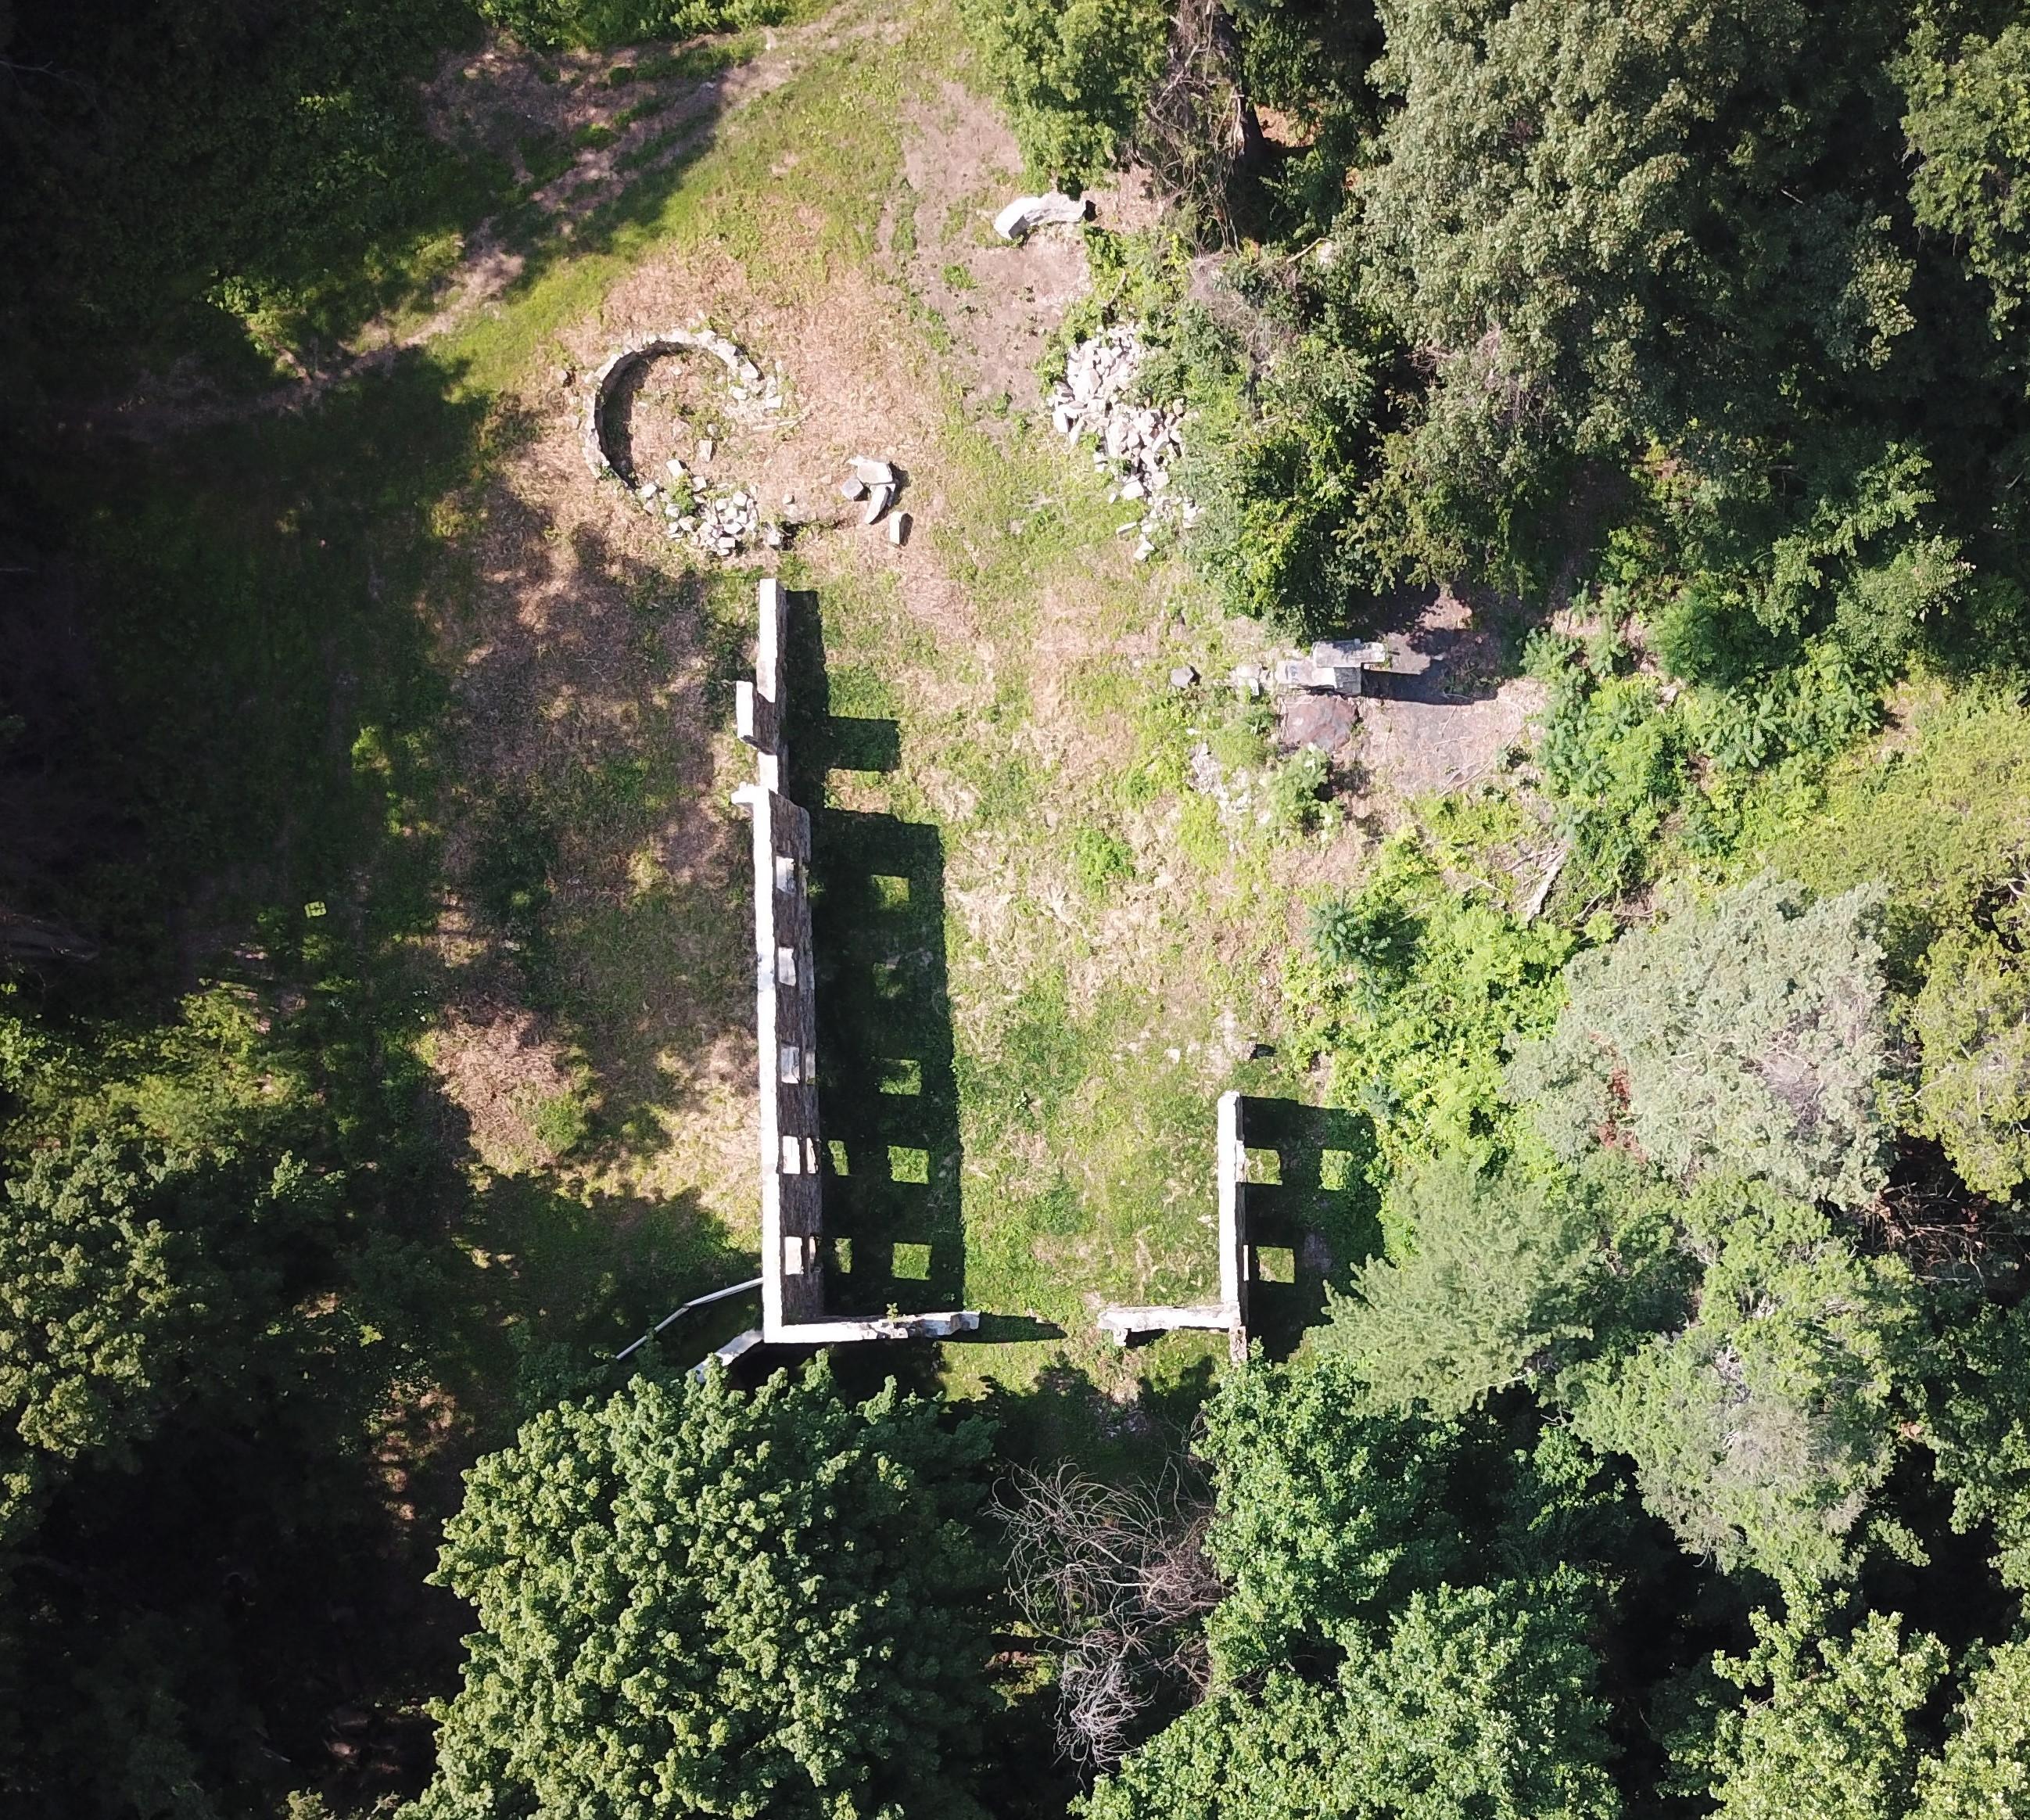 Black Mansion Aerial - image courtesy of Maureen Koehl